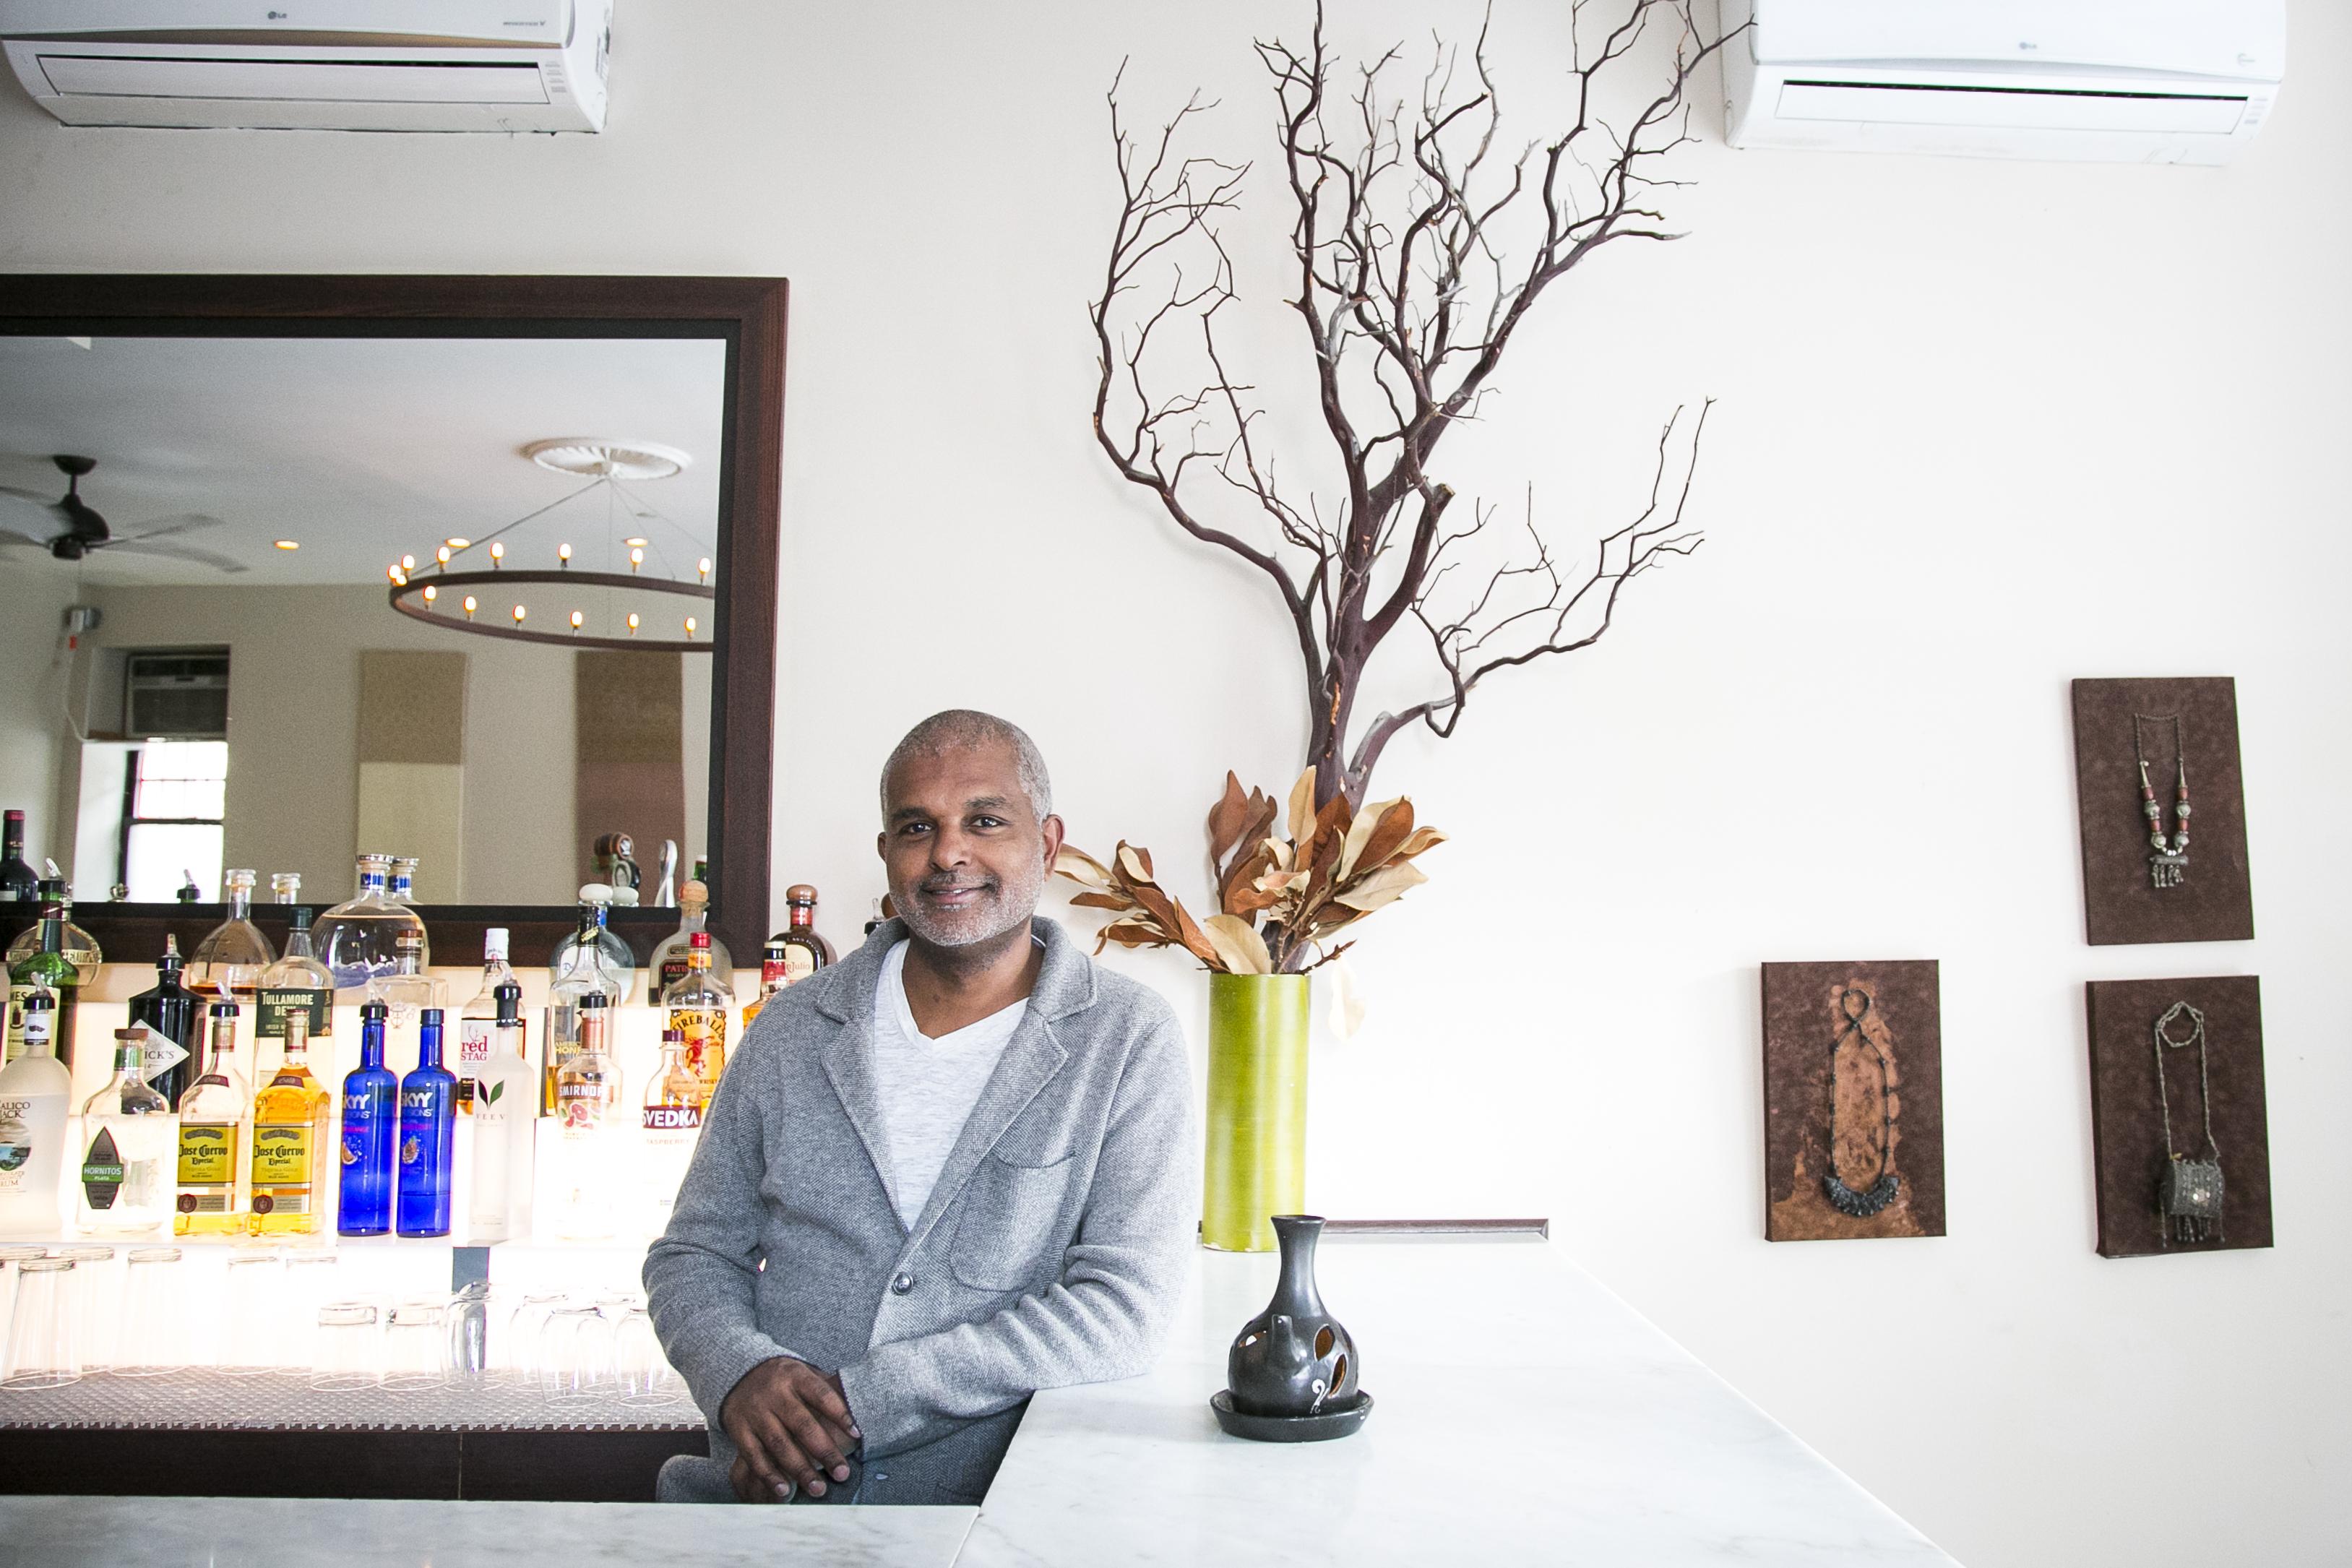 Owner Henock T. Kejela, whose restaurant Zoma is part of  New York African Restaurant Week. (Samira Bouaou/Epoch Times)